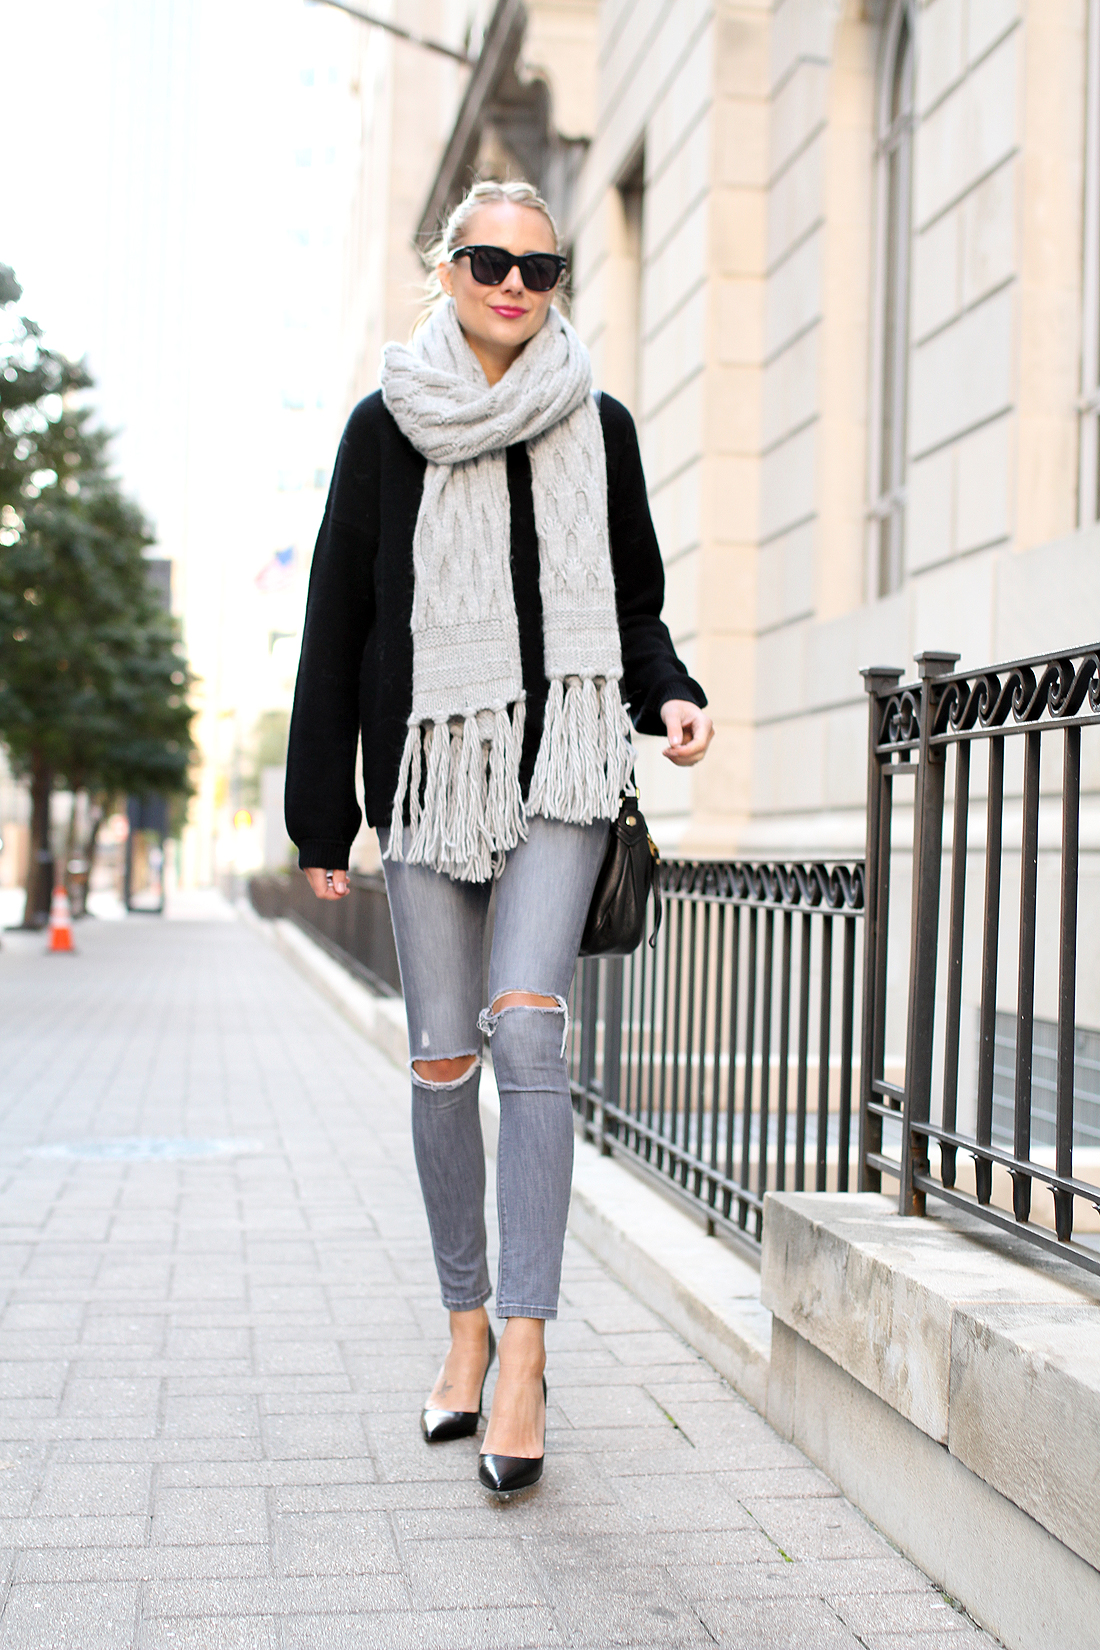 fashion-jackson-celine-sunglasses-banana-republic-grey-fringe-scarf-black-sweater-grey-ripped-skinny-jeans-black-pumps